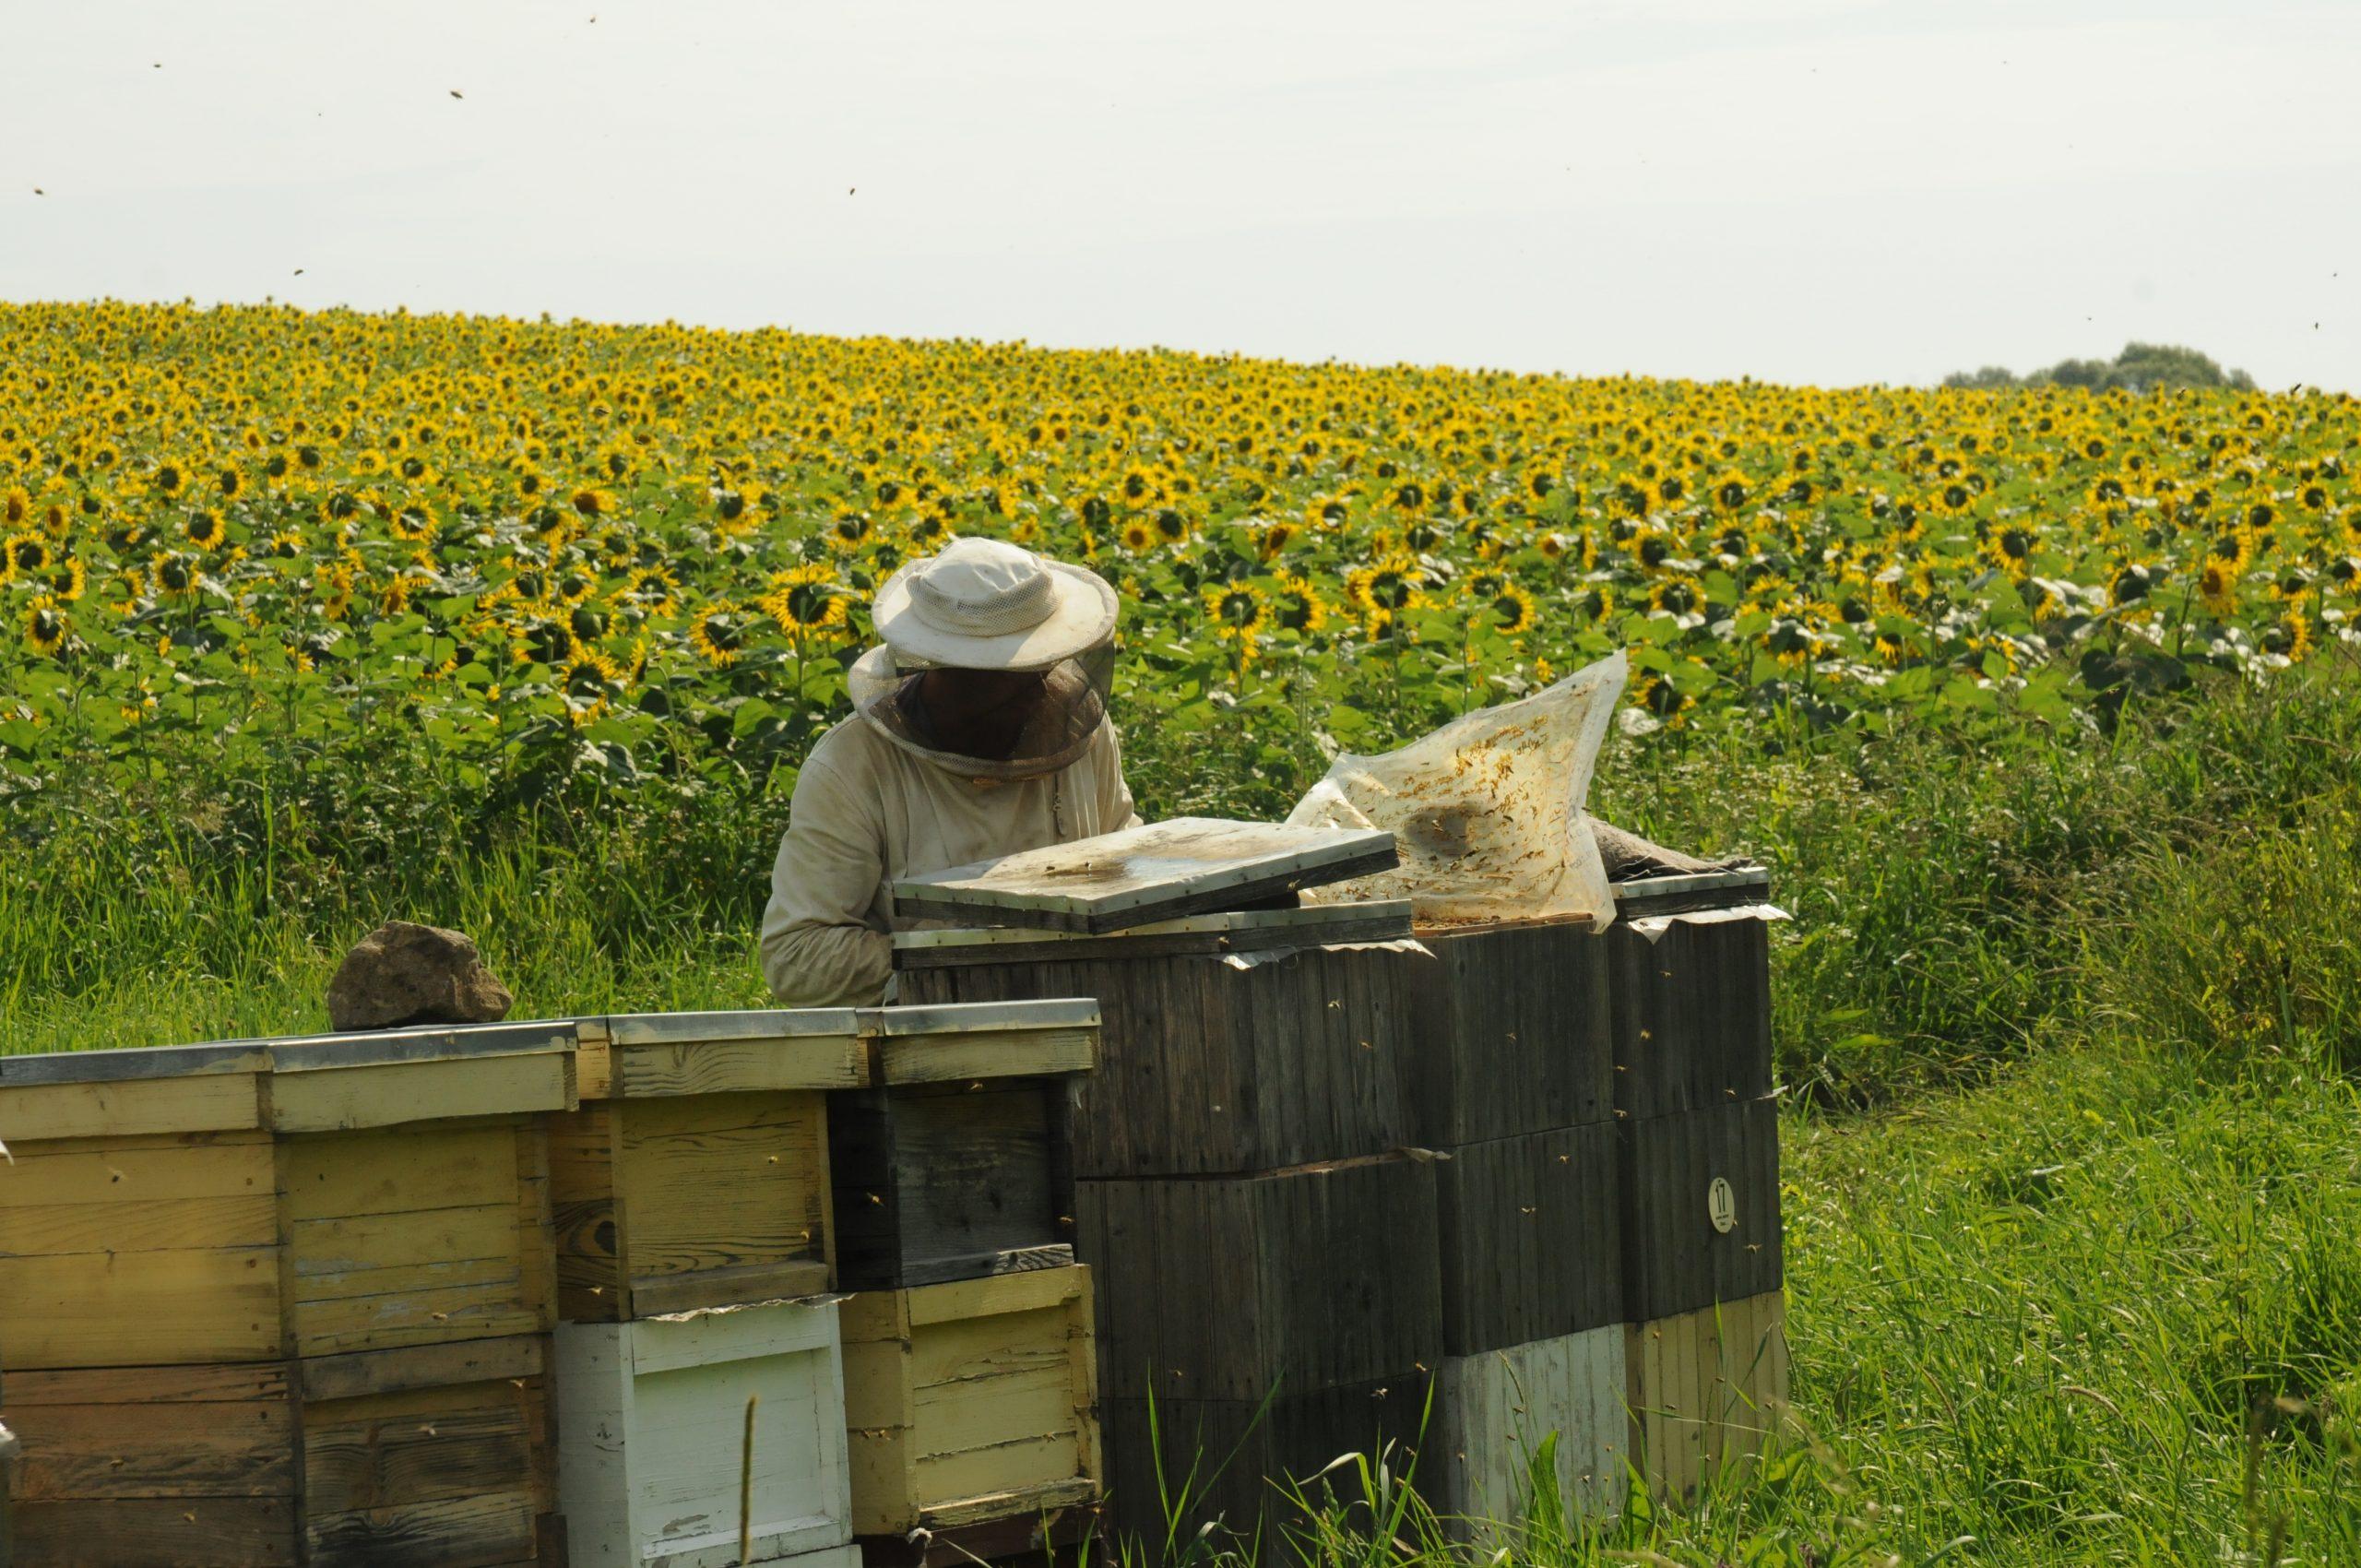 Honey Farm next to Sunflower field